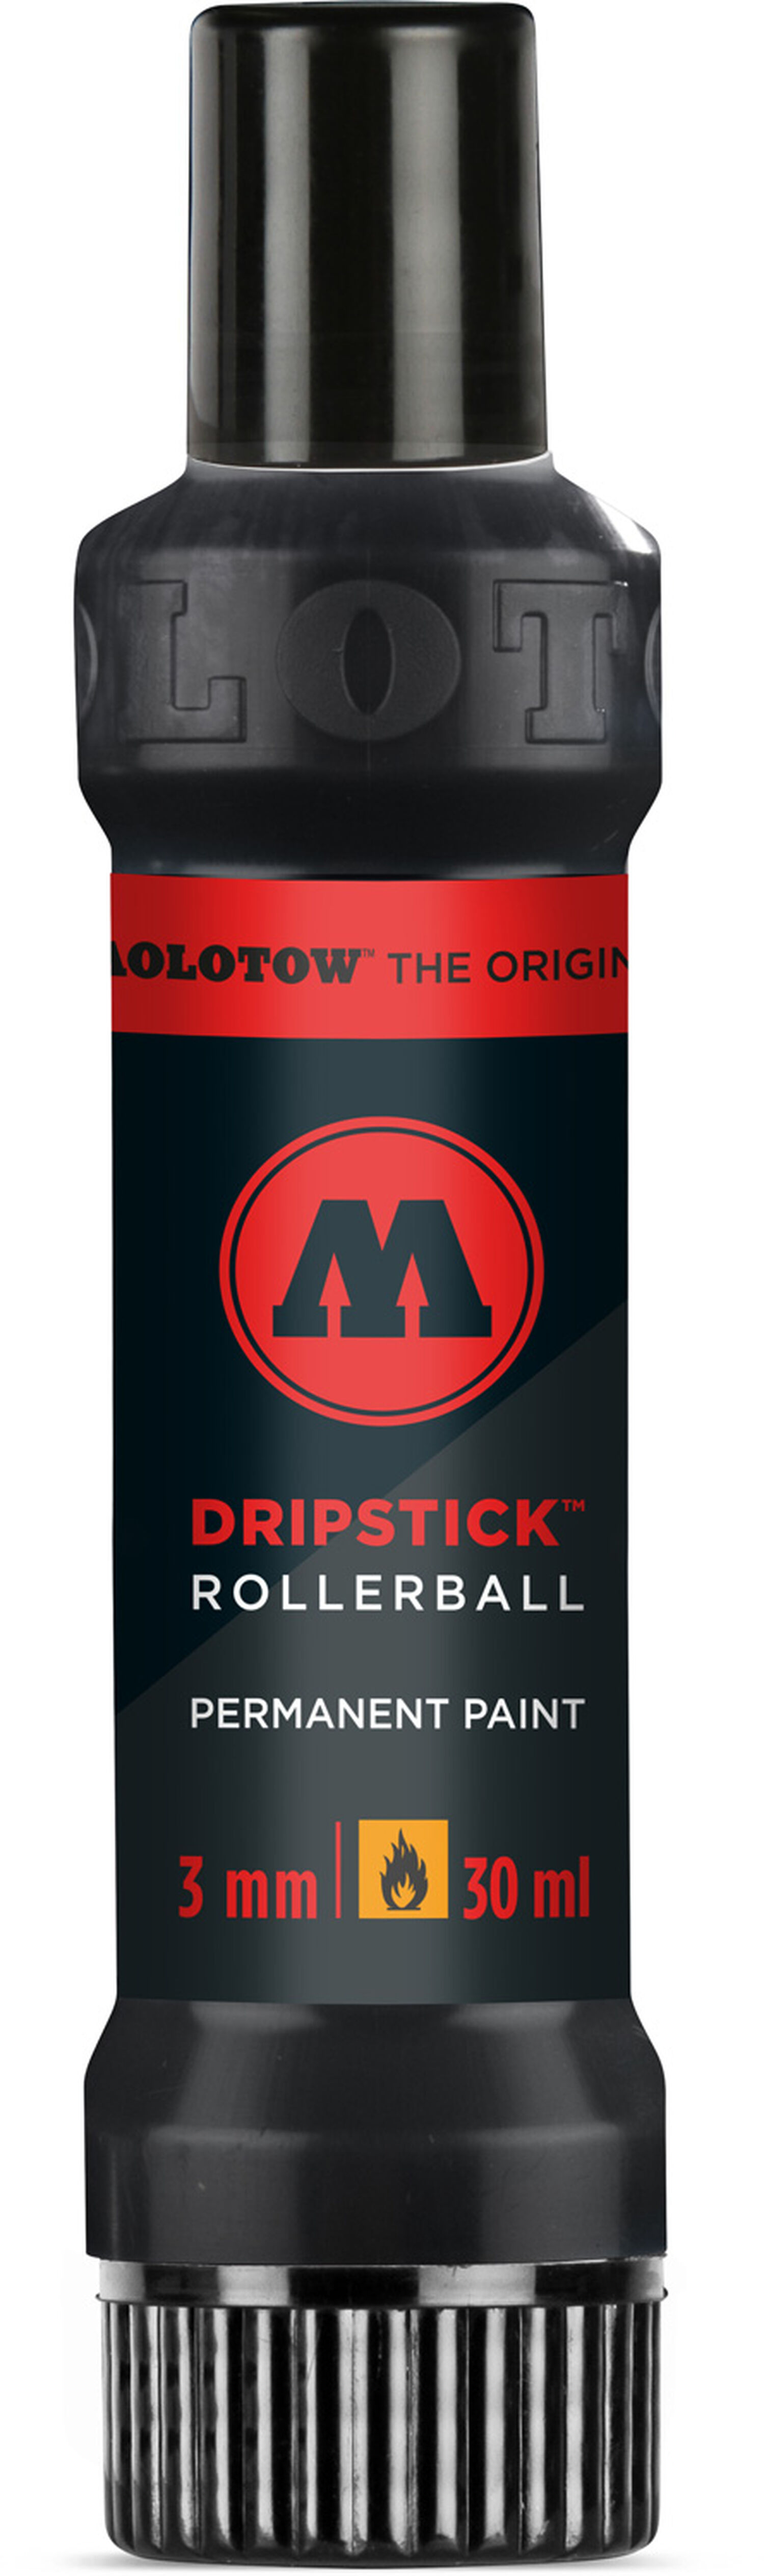 Dripstick Rollerball